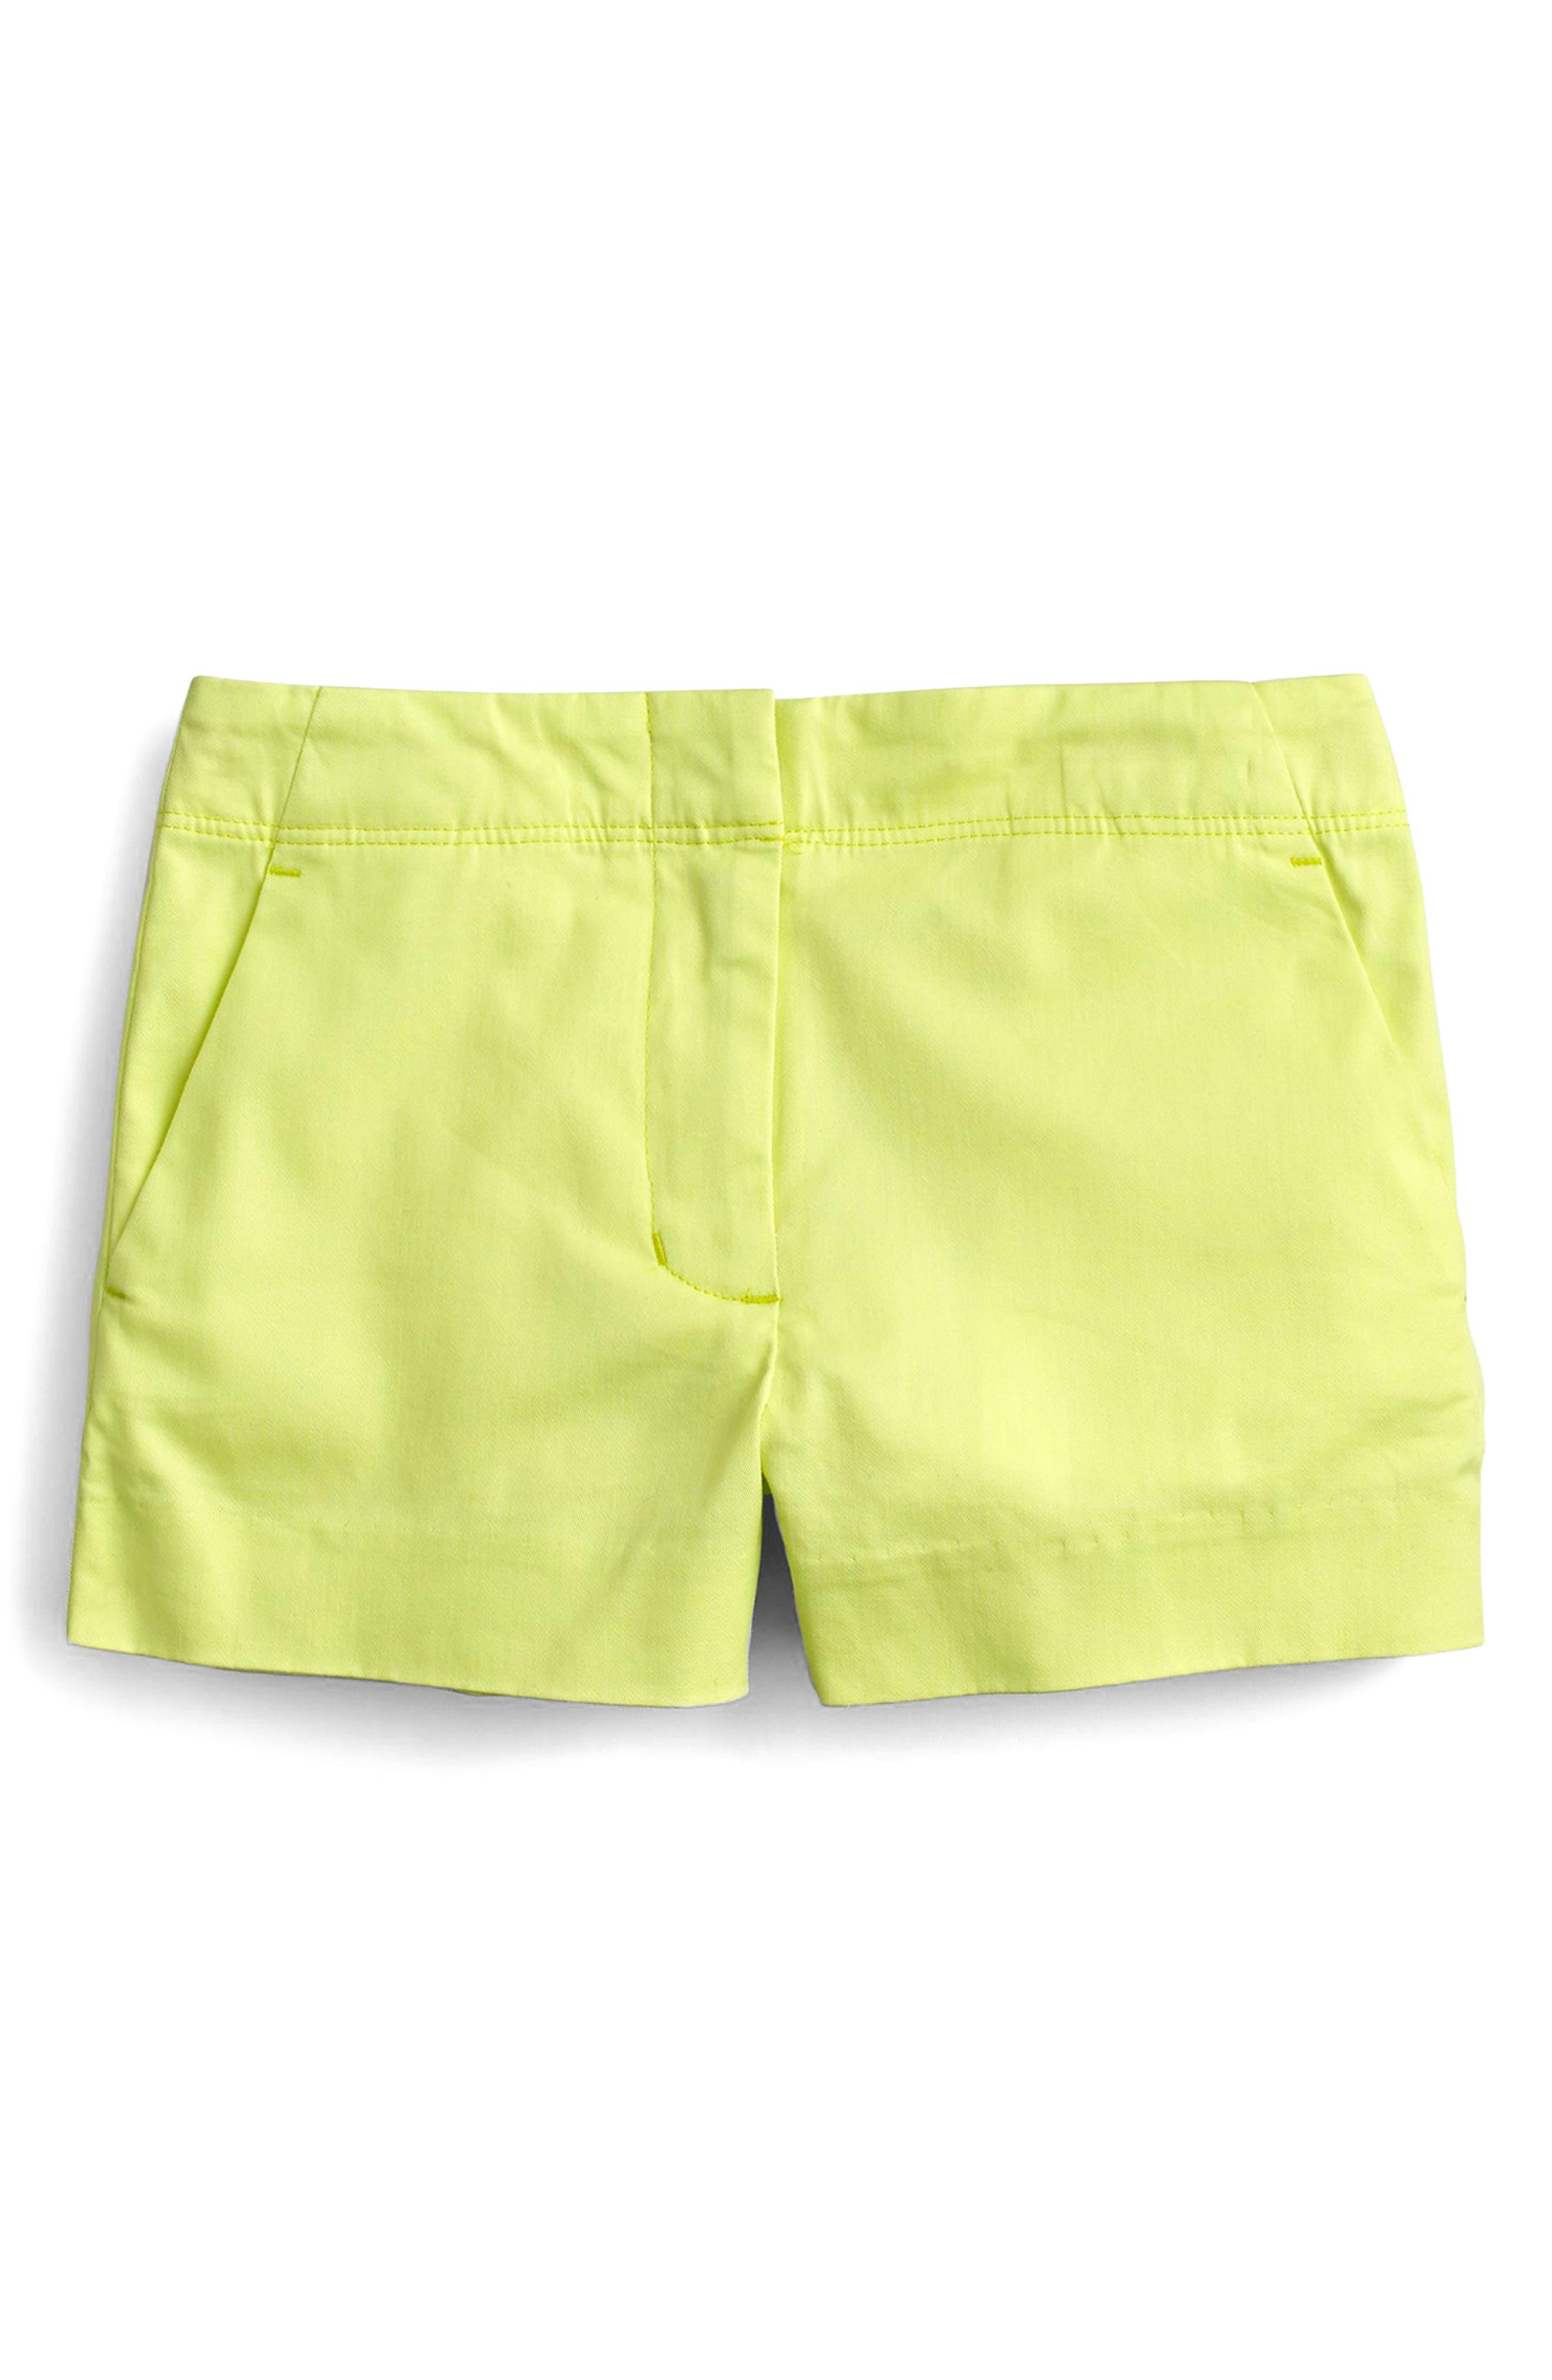 crewcuts by J.Crew Frankie Stretch Cotton Shorts (Toddler Girls, Little Girls & Big Girls)